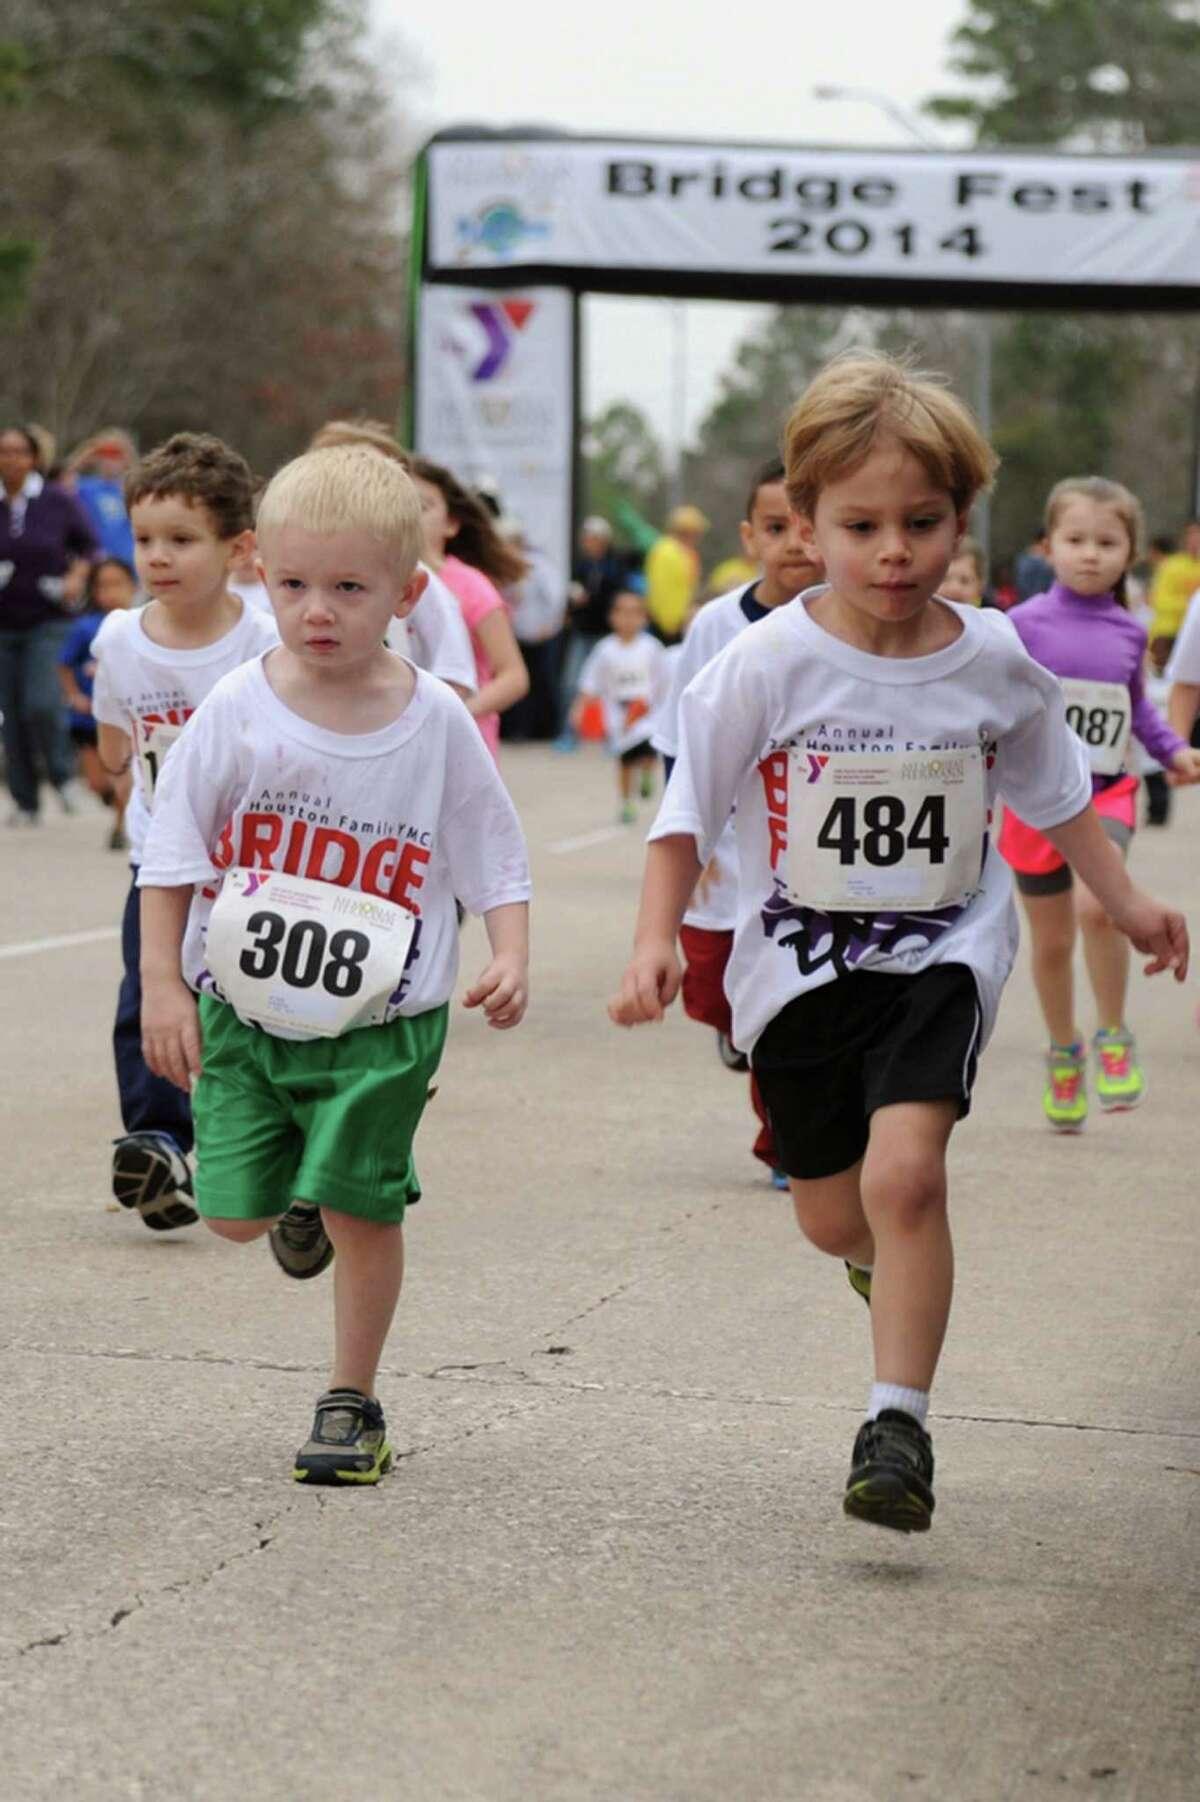 Kids participating in Bridgefest Run 2014,